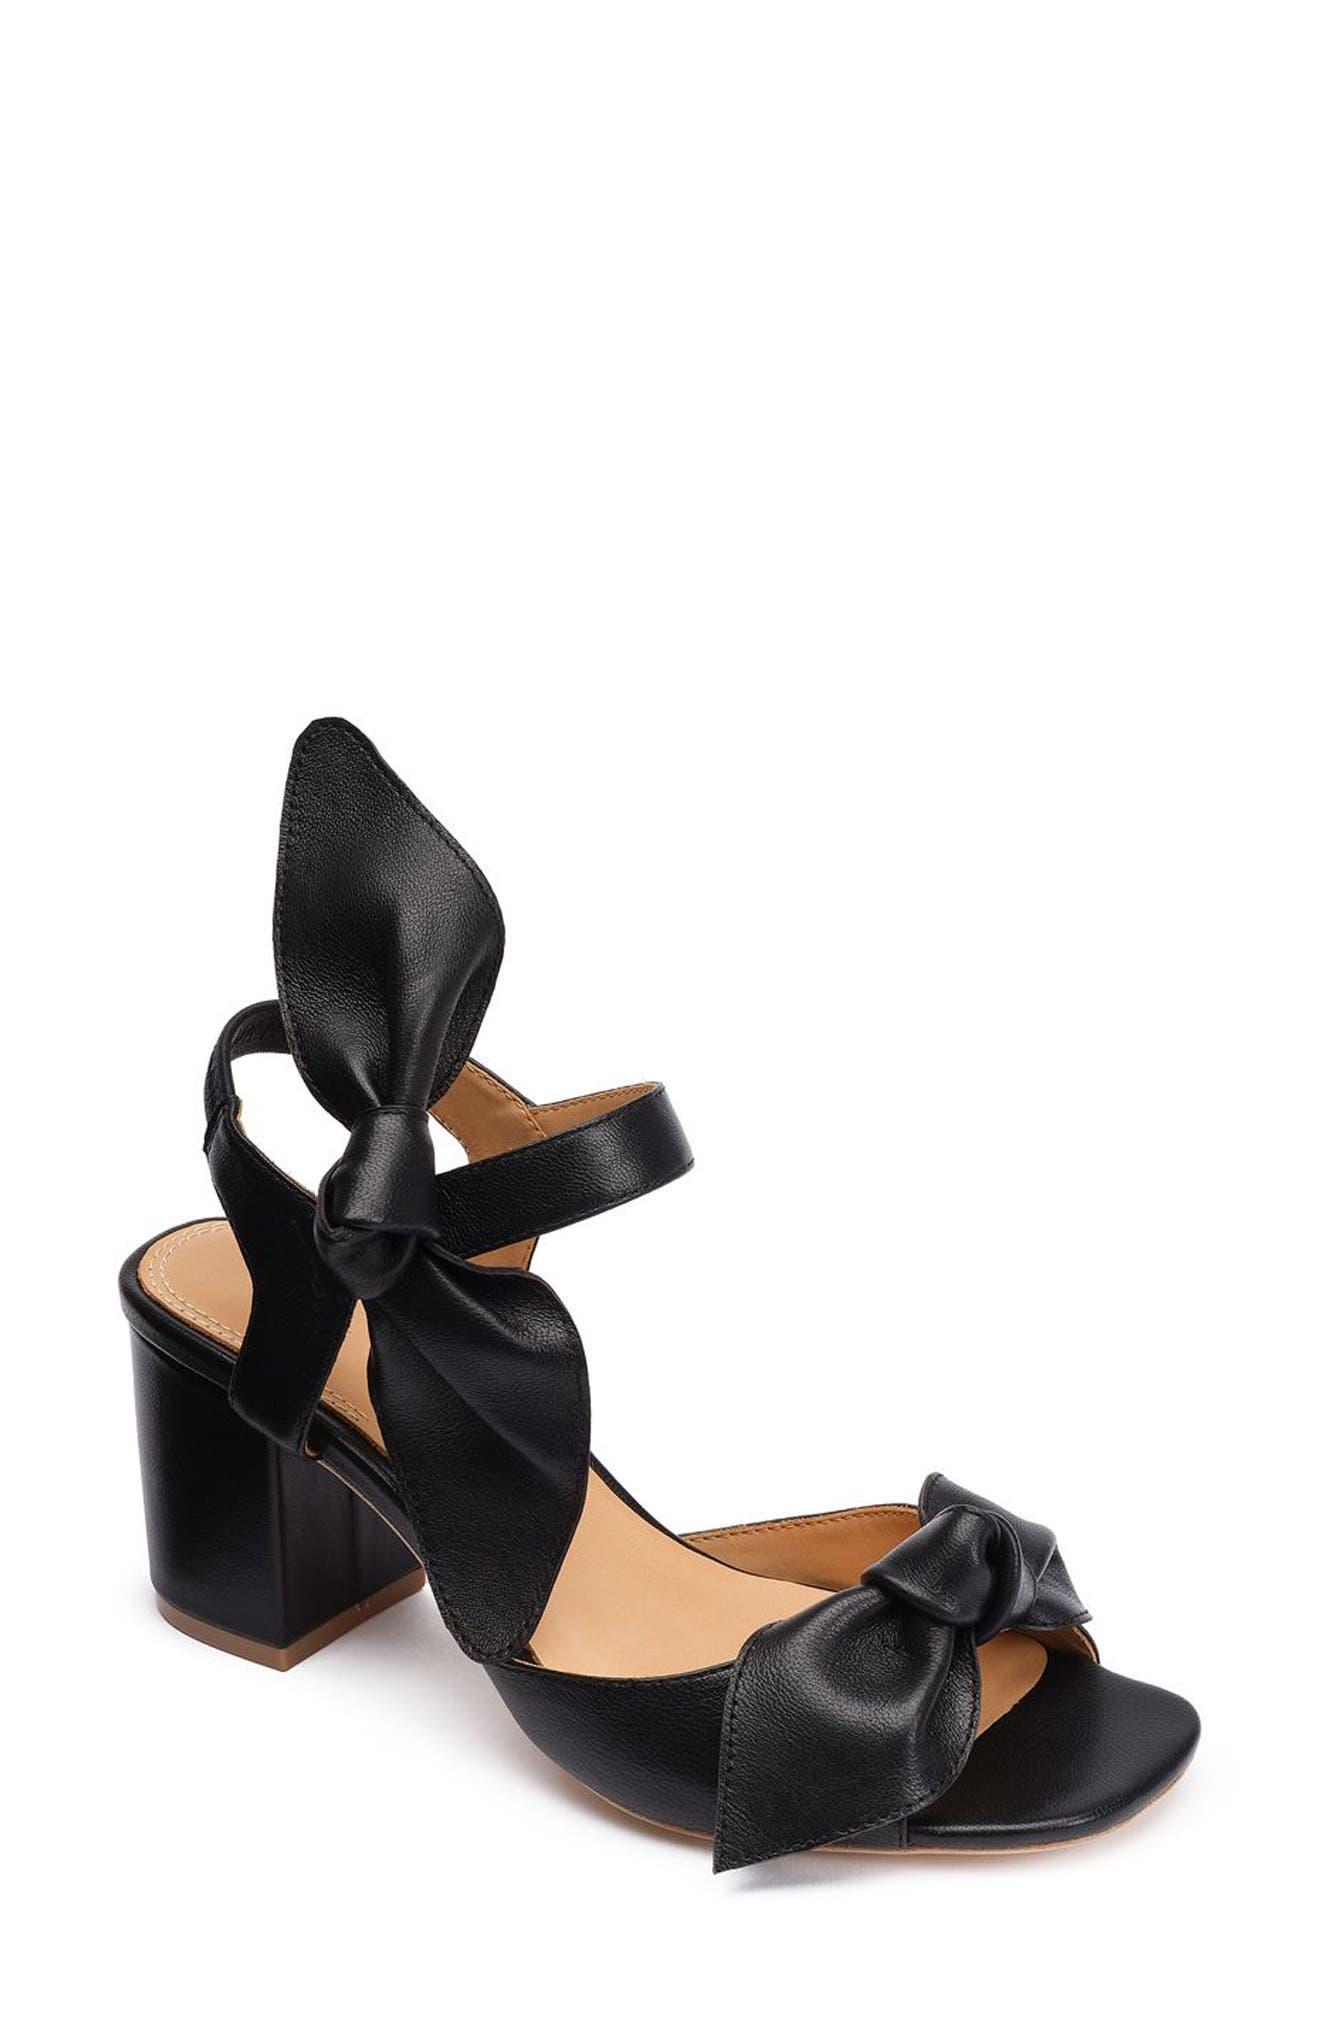 Carmen 65 Knotted Sandal,                         Main,                         color, 001